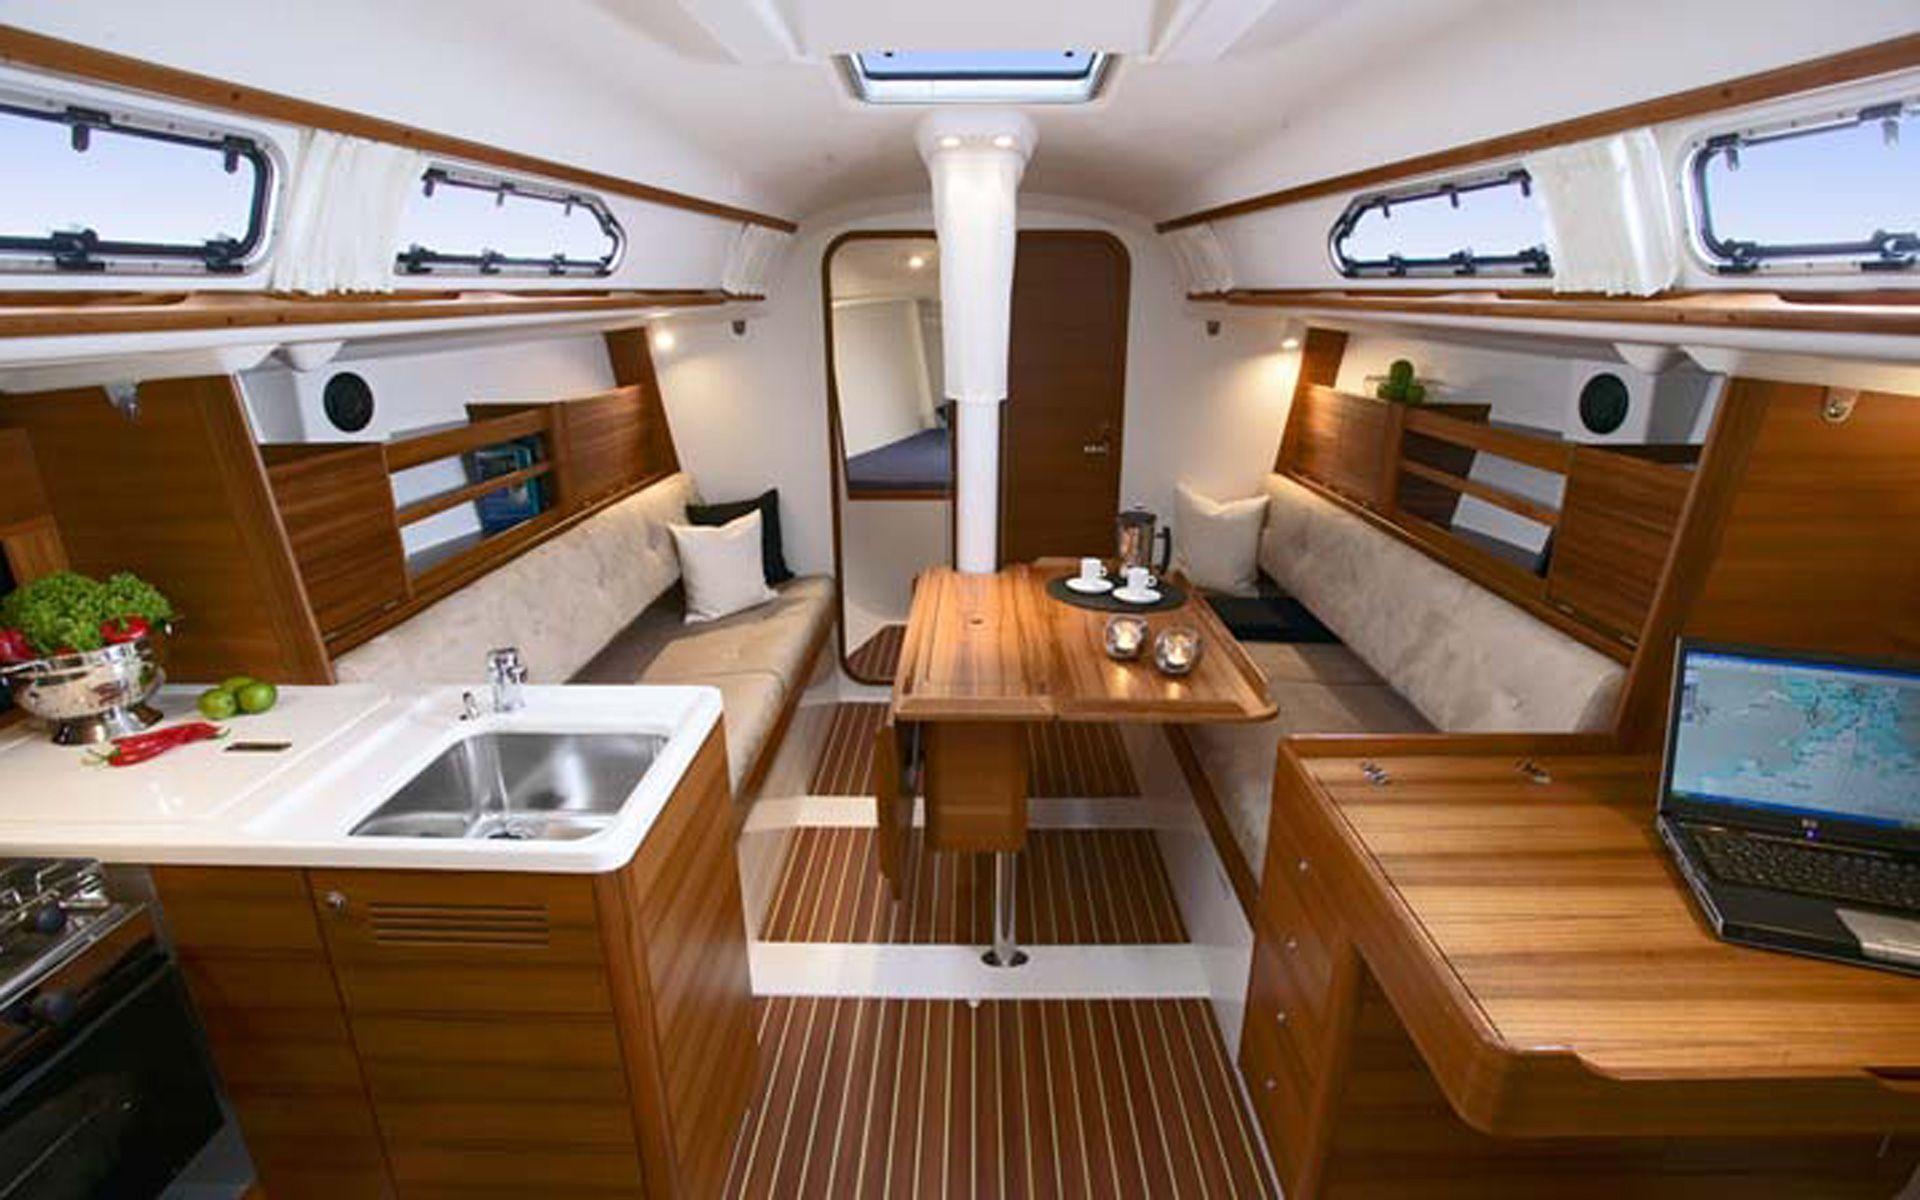 Building A Sailboat Interior - Google Search